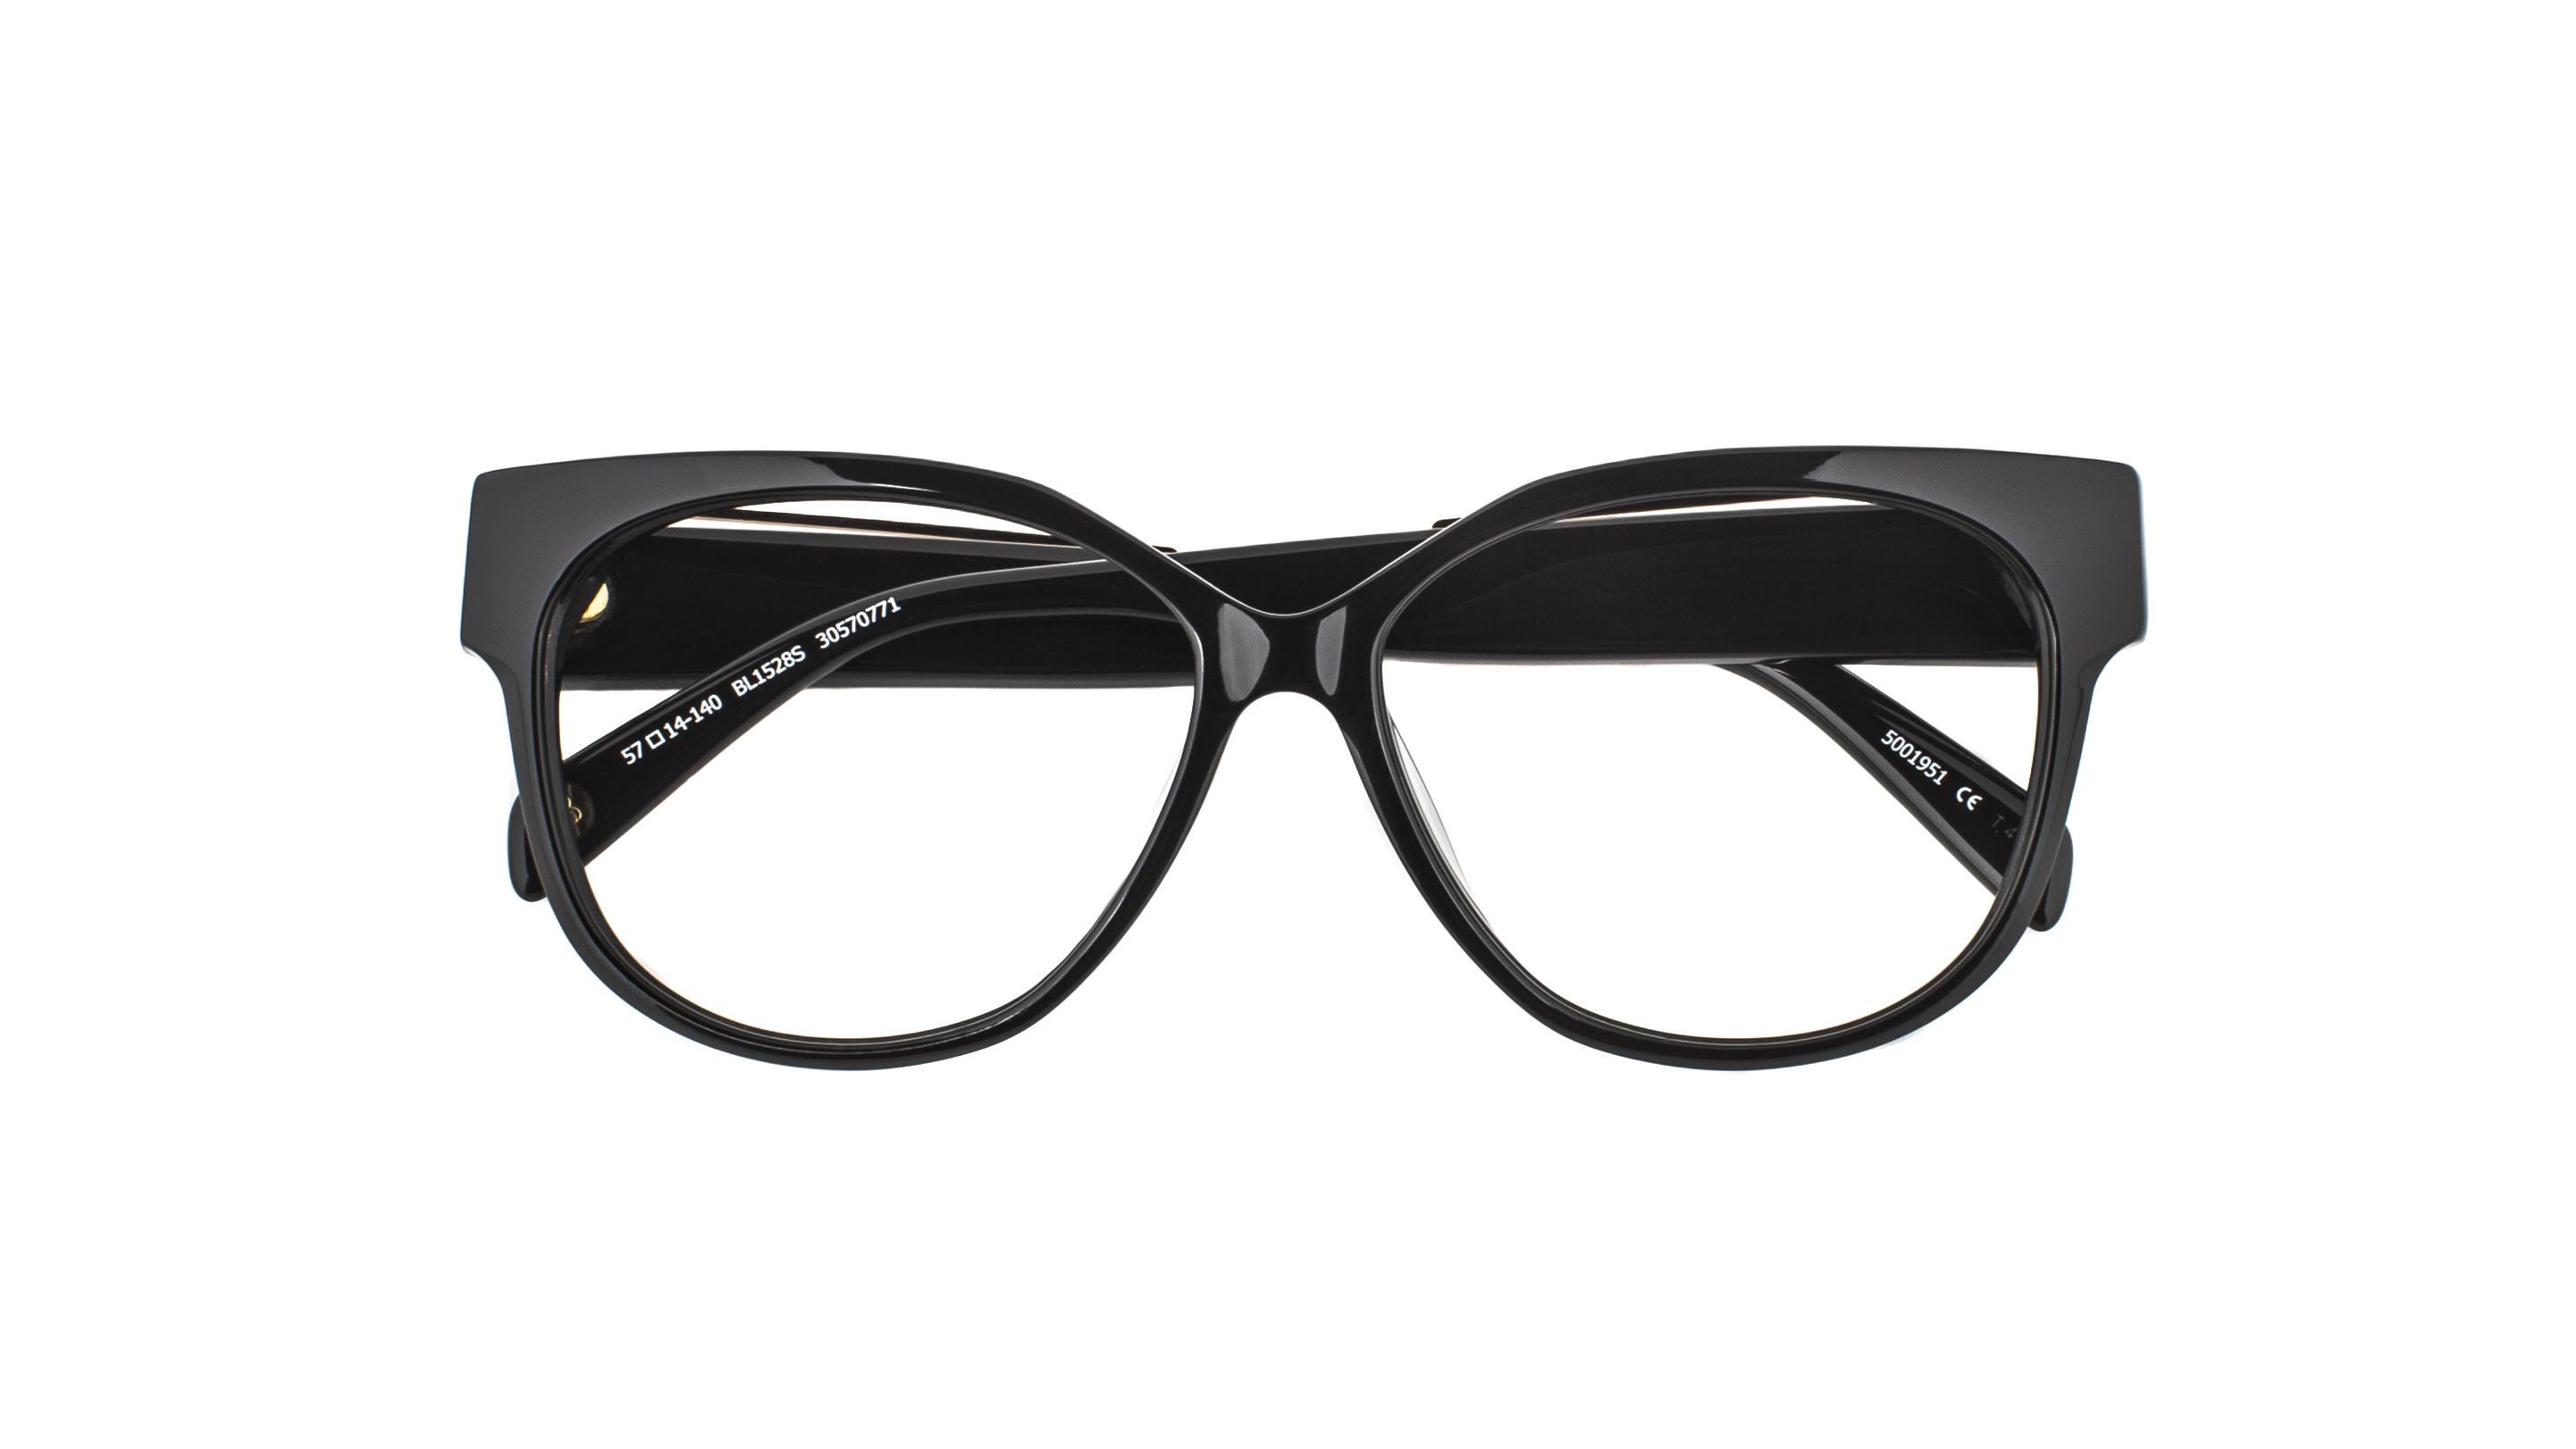 Balmain x Specsavers BL1528S 30570771 - RRP 2 pairs single vision $459